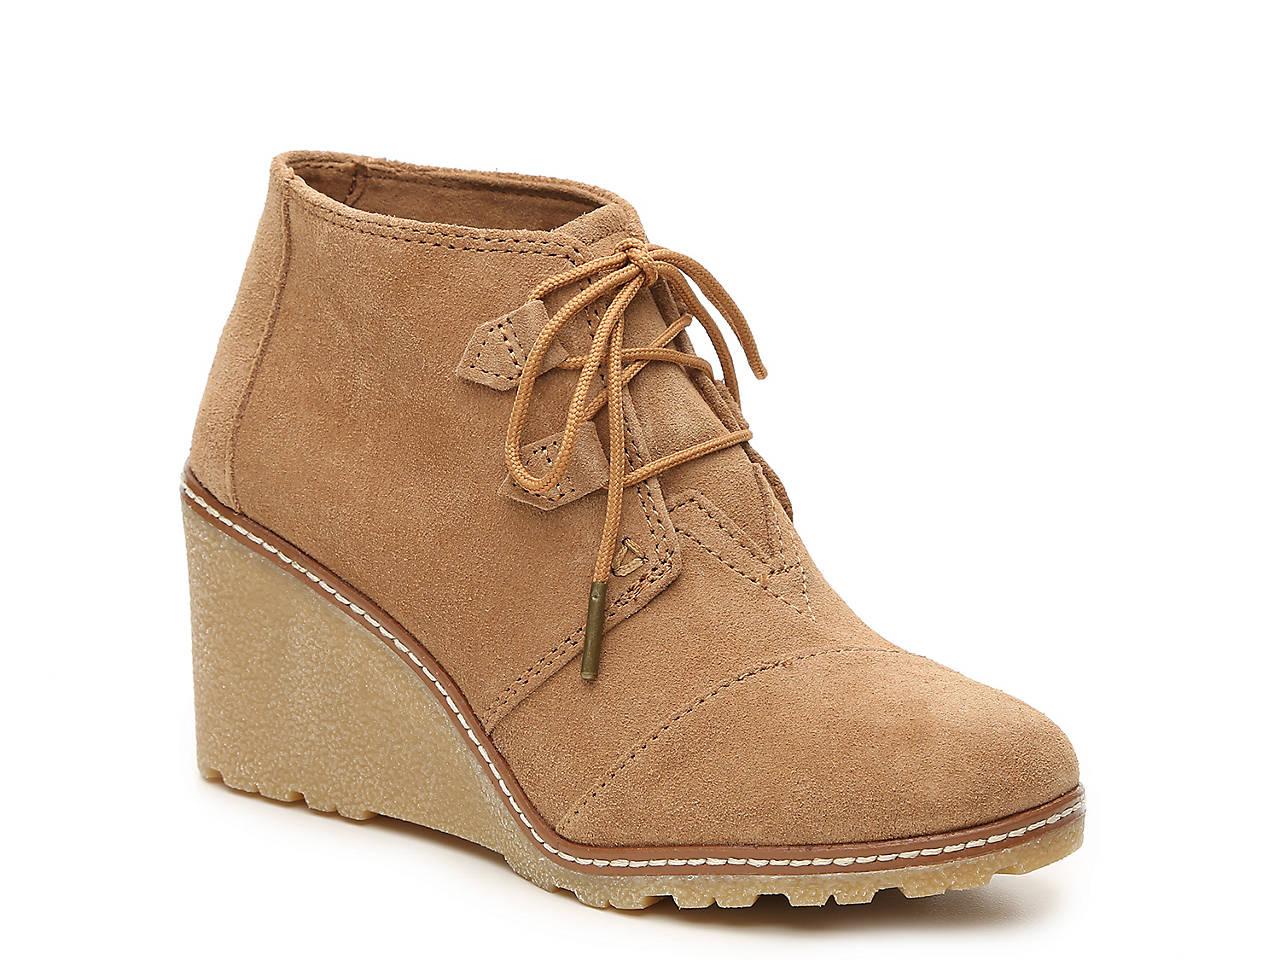 b409a016143 TOMS Desert Wedge Bootie Men s Shoes